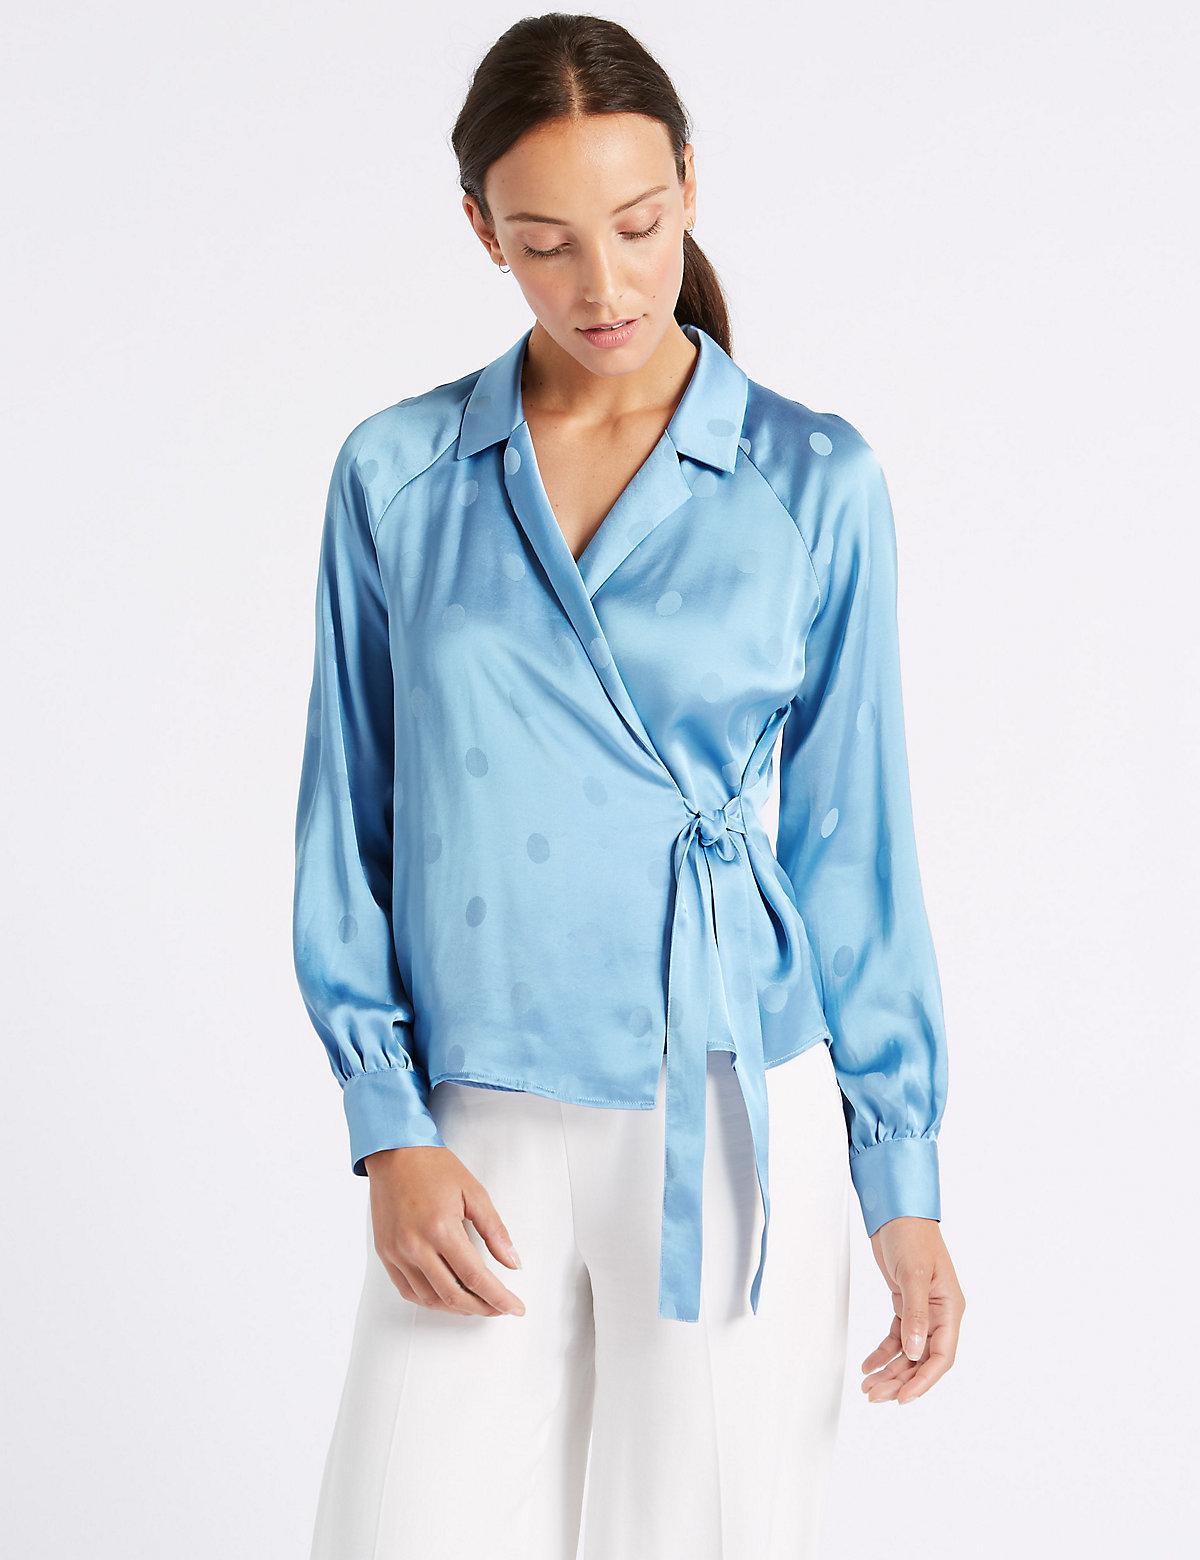 Marks & Spencer Spotted Satin V-Neck Long Sleeve Blouse - - 12 Really Cheap Online Real Sale Online Buy Cheap Cheap Buy Online Authentic Buy Cheap 100% Original vKO2TVf